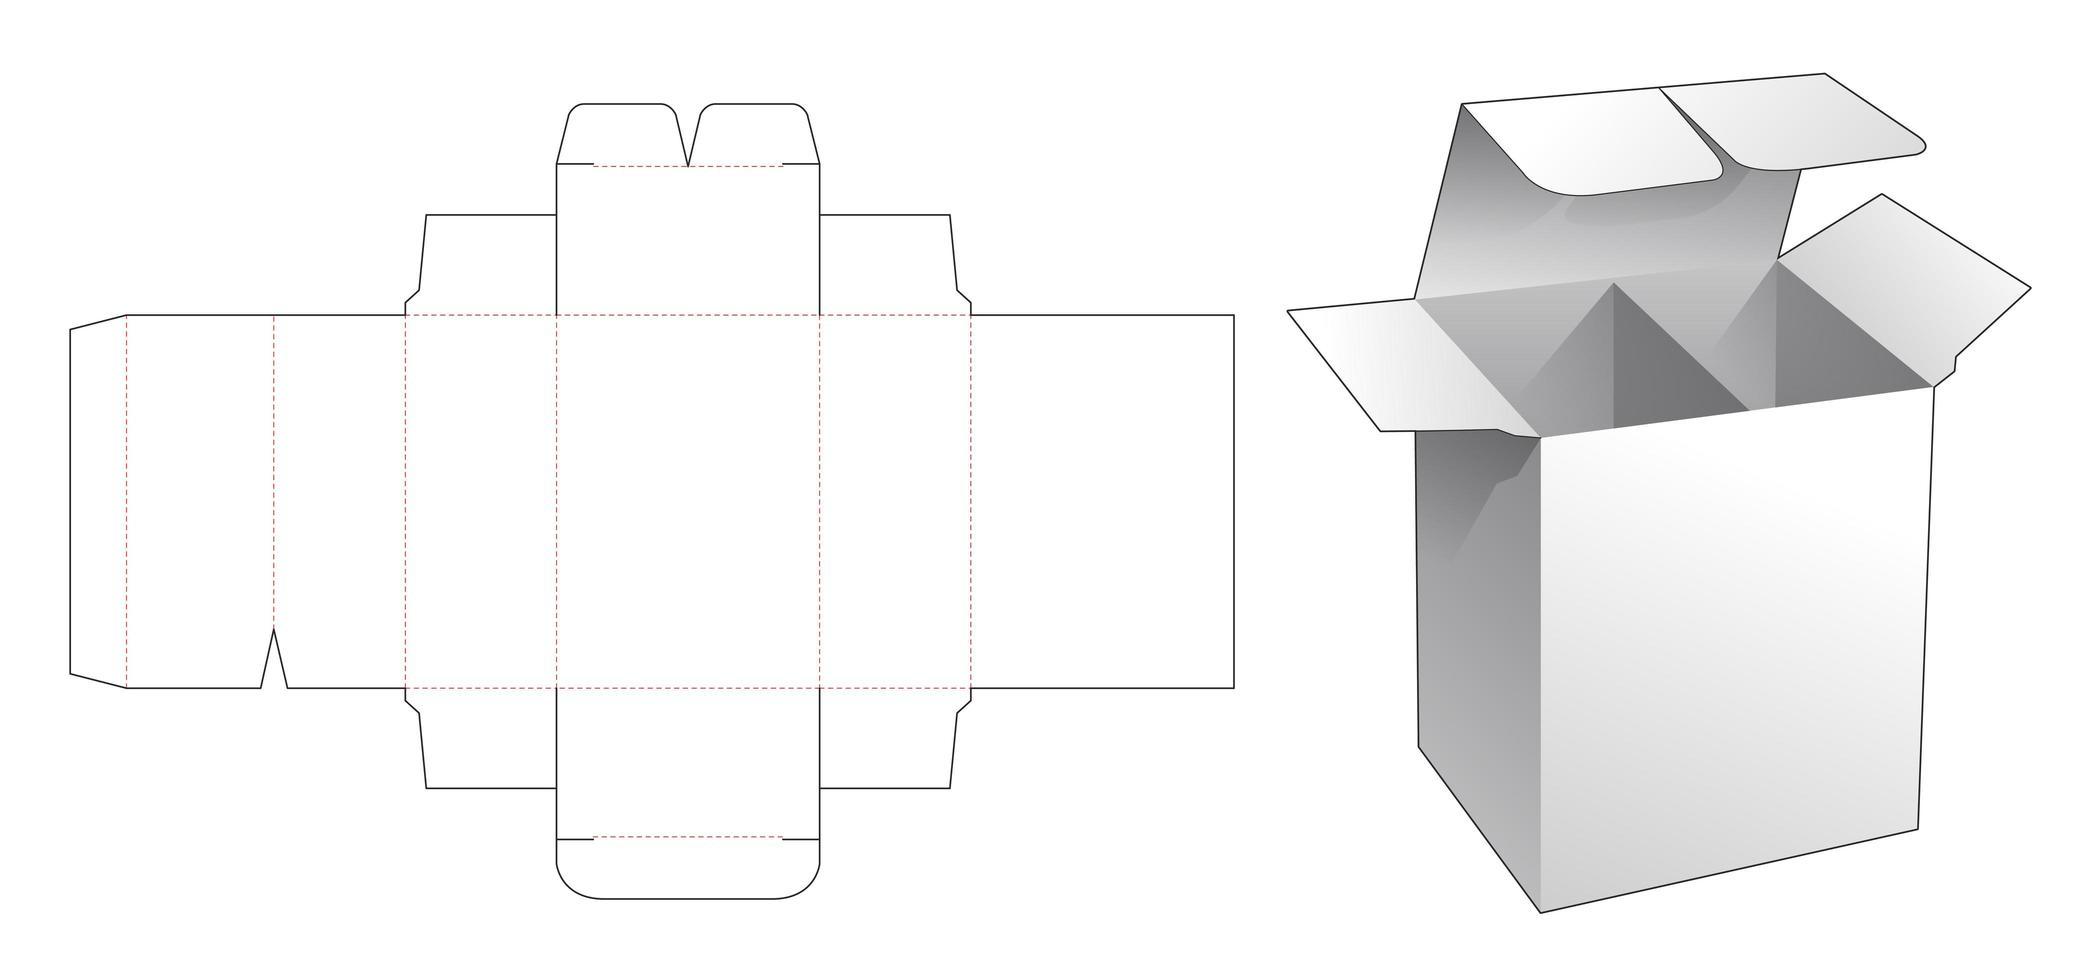 1 Stück Verkaufsbox mit Trennwand vektor